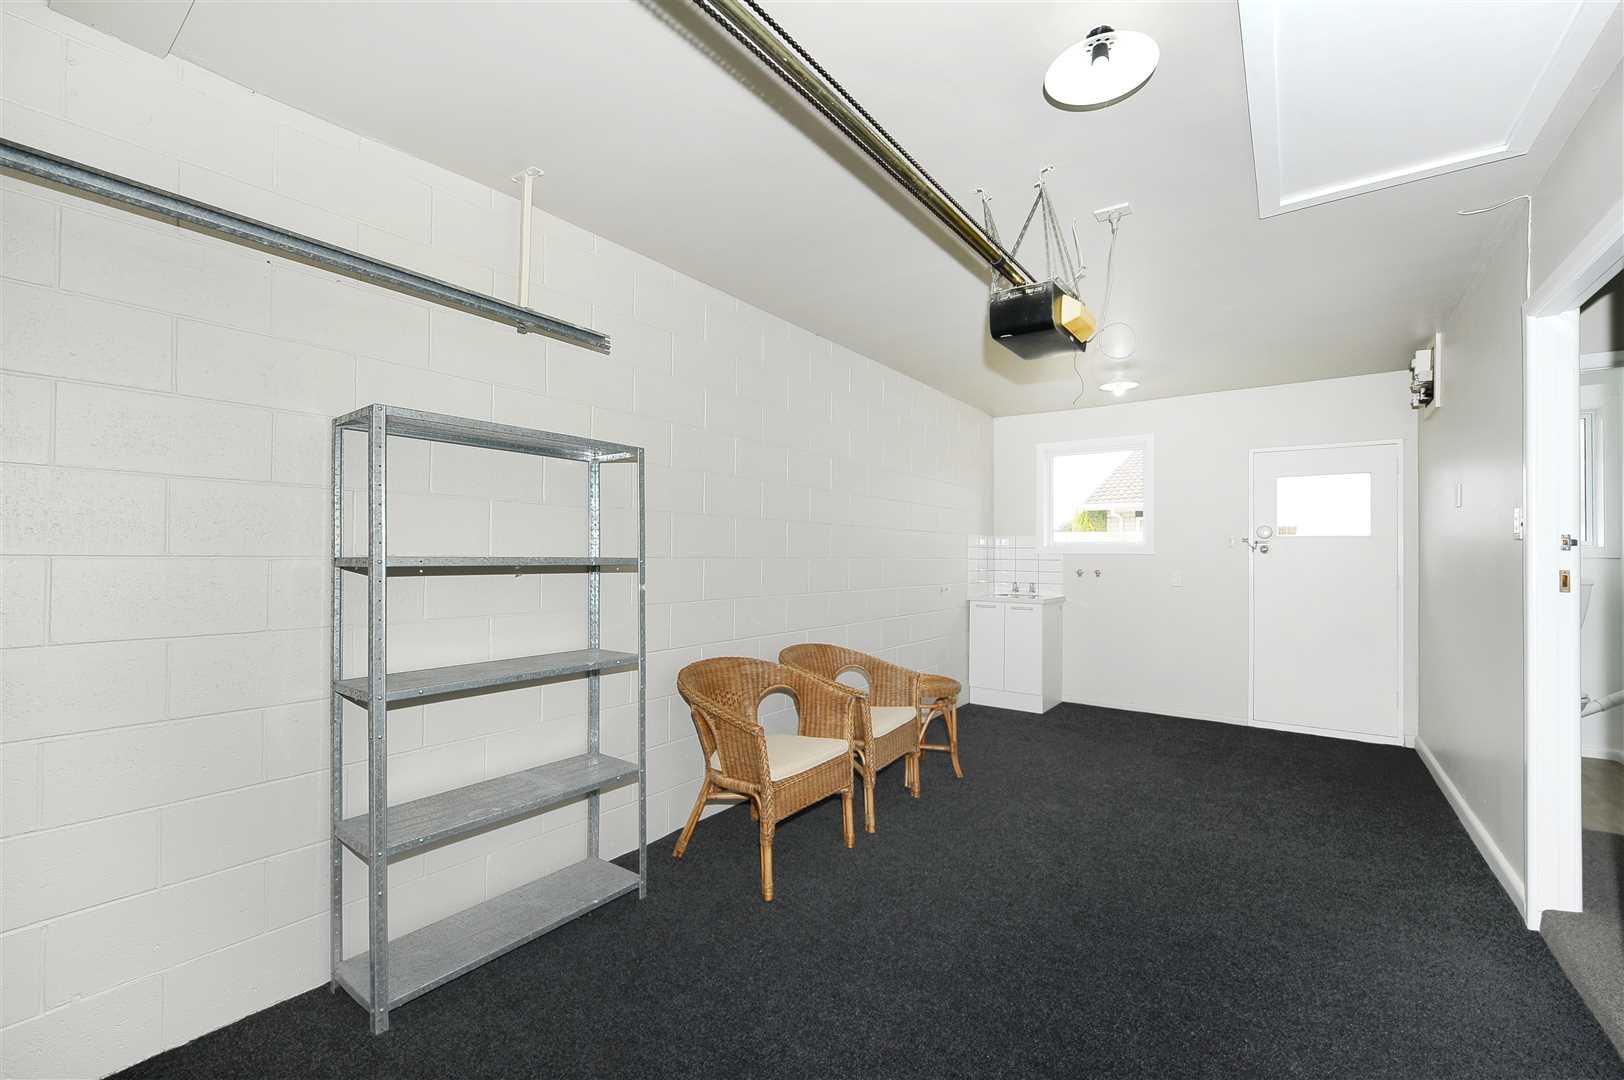 Single internal access garage